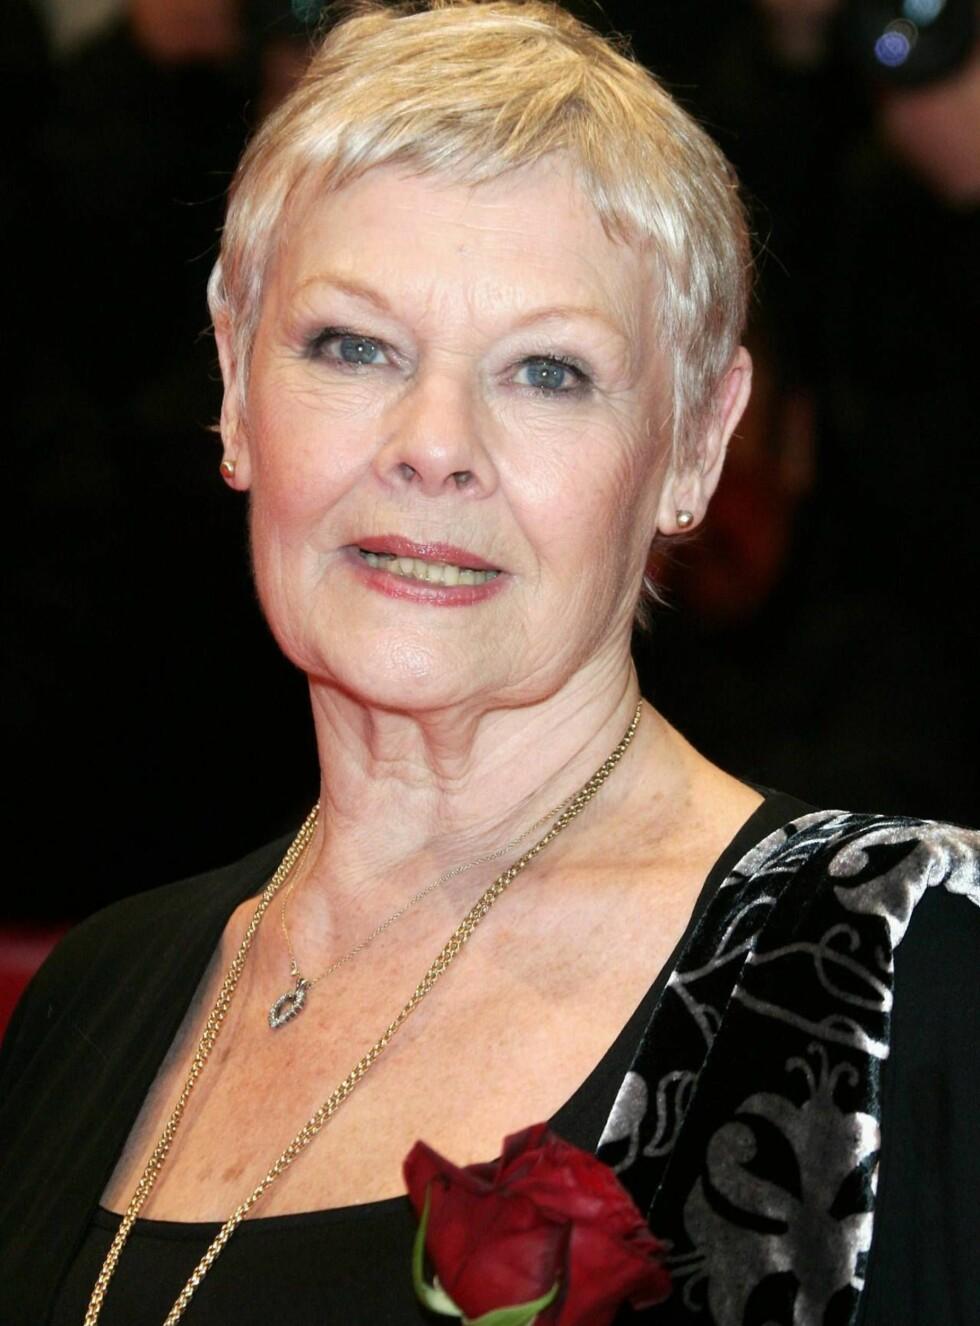 BESKJEDEN STJERNE: Judi Dench er overbevist om at hun ikke vinner noen Oscar i år. Foto: All Over Press